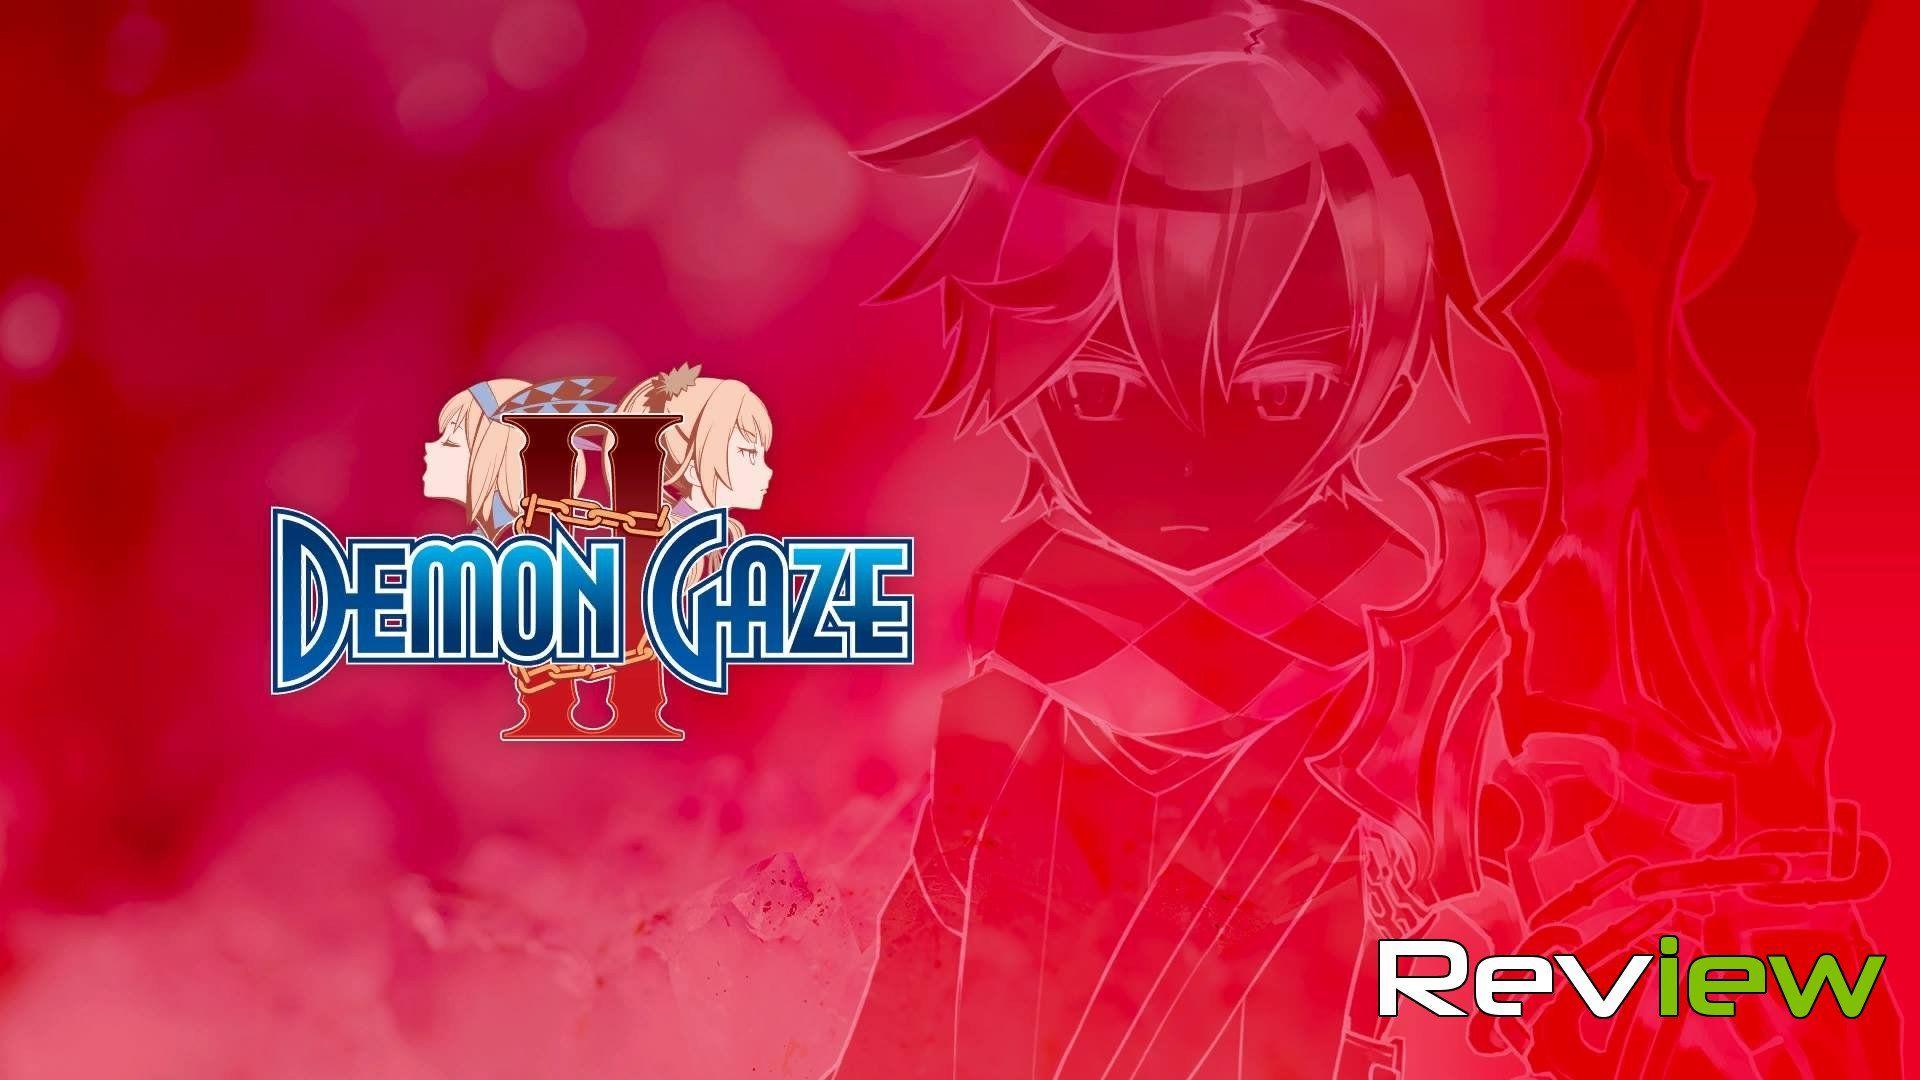 Demon gaze ii review if you gaze into the abyss demon